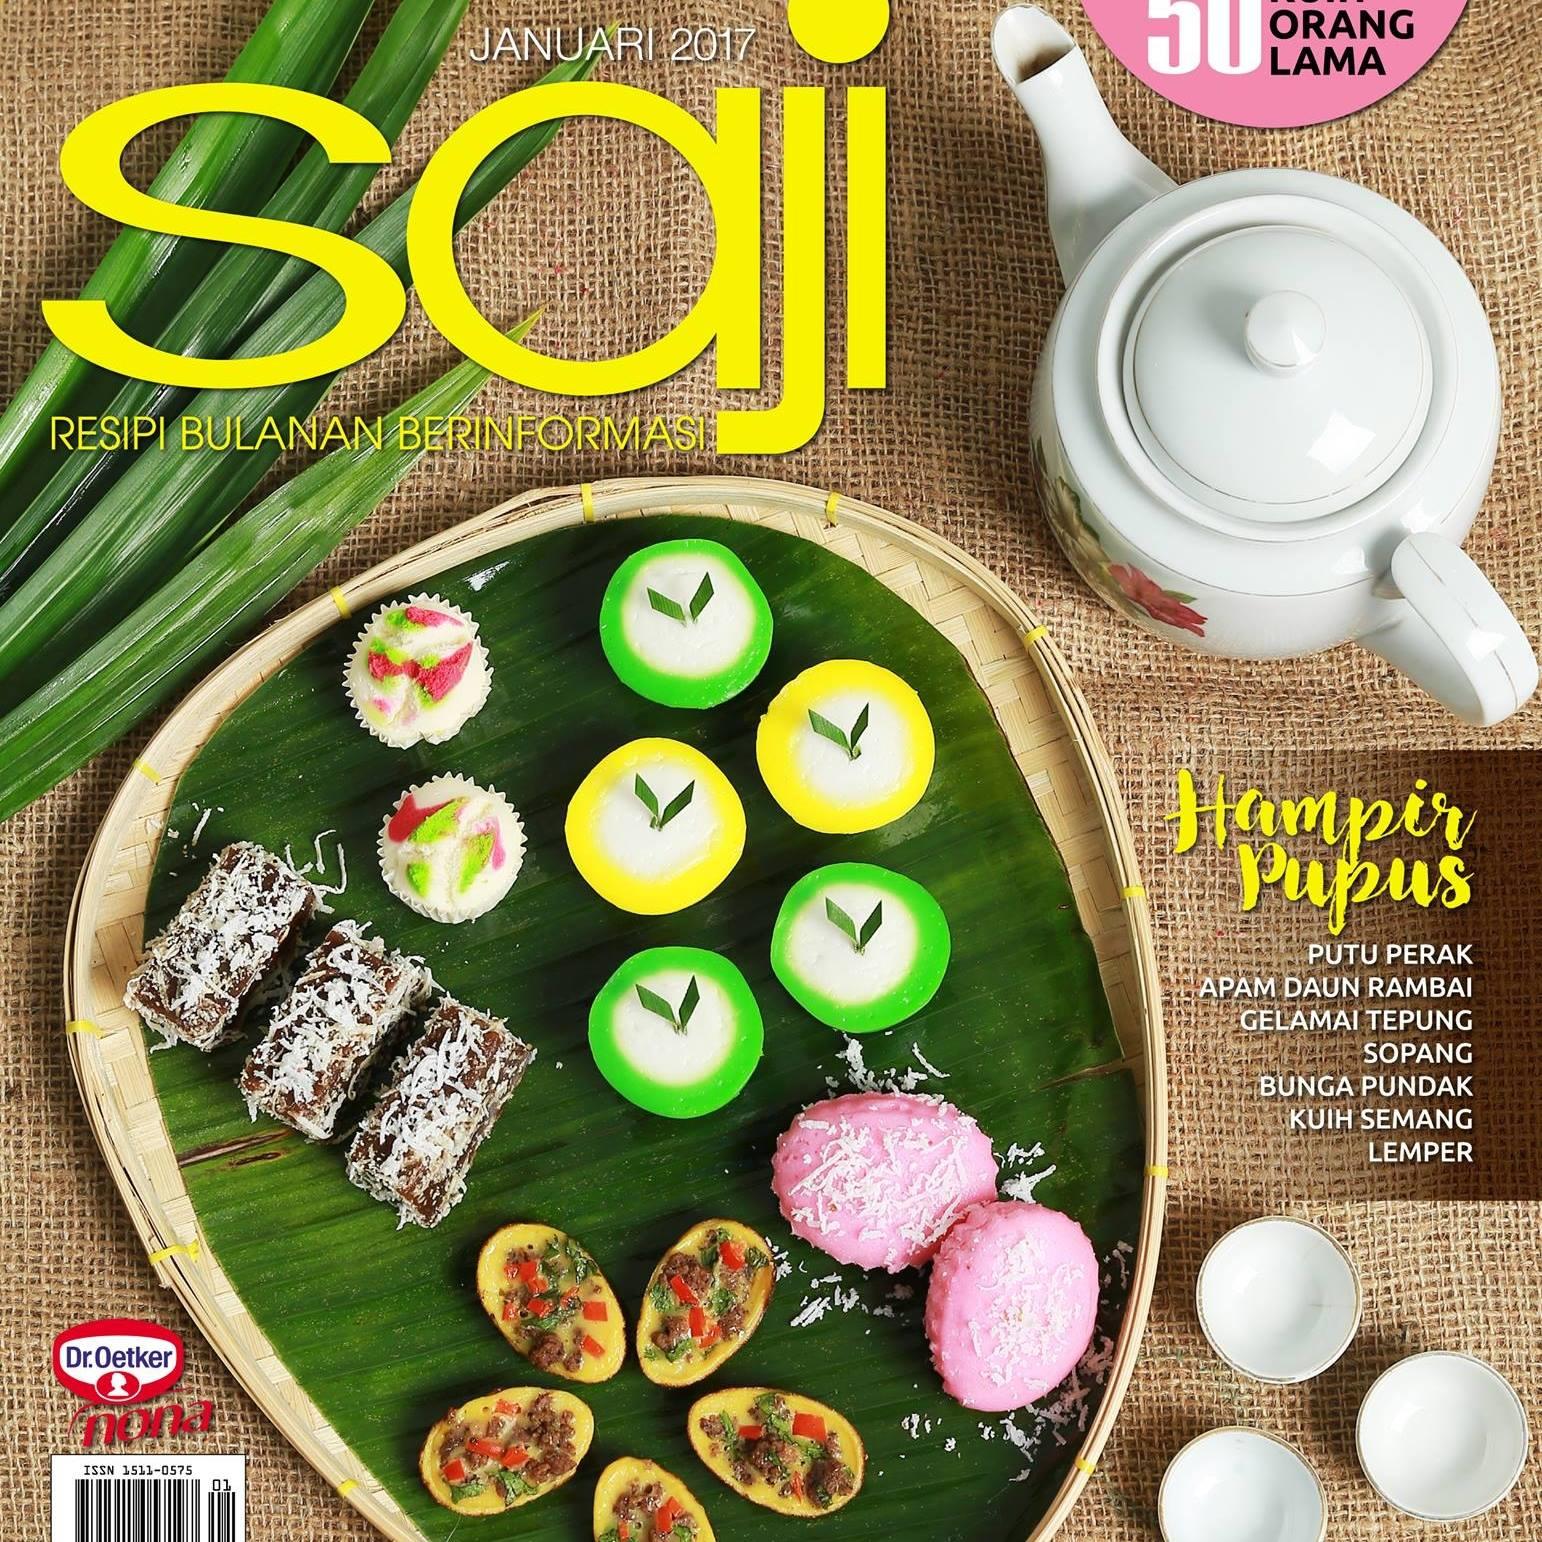 Mamadee di Majalah Saji